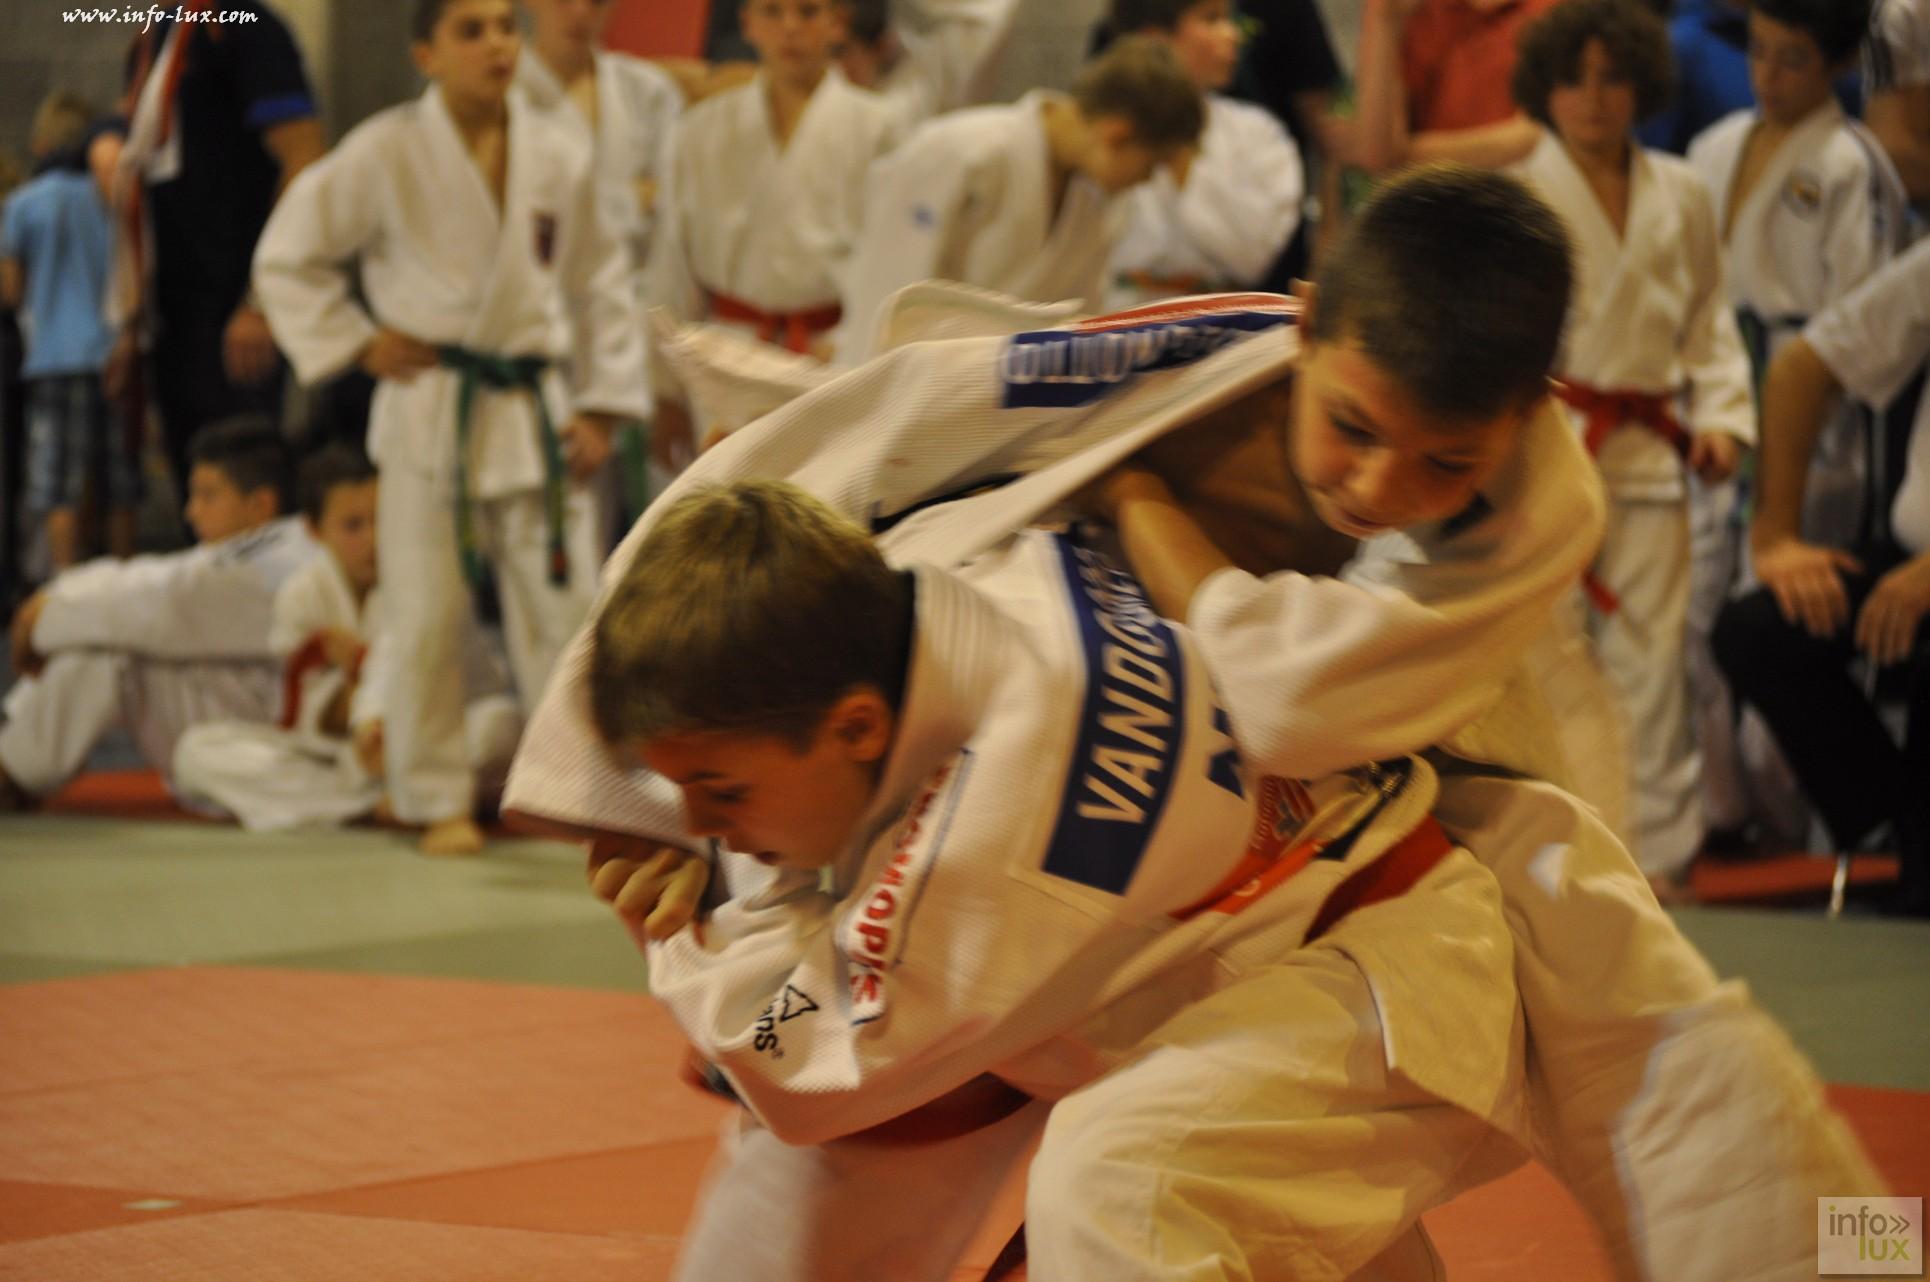 images/stories/PHOTOSREP/Bastogne/judo/Judo-Basto66